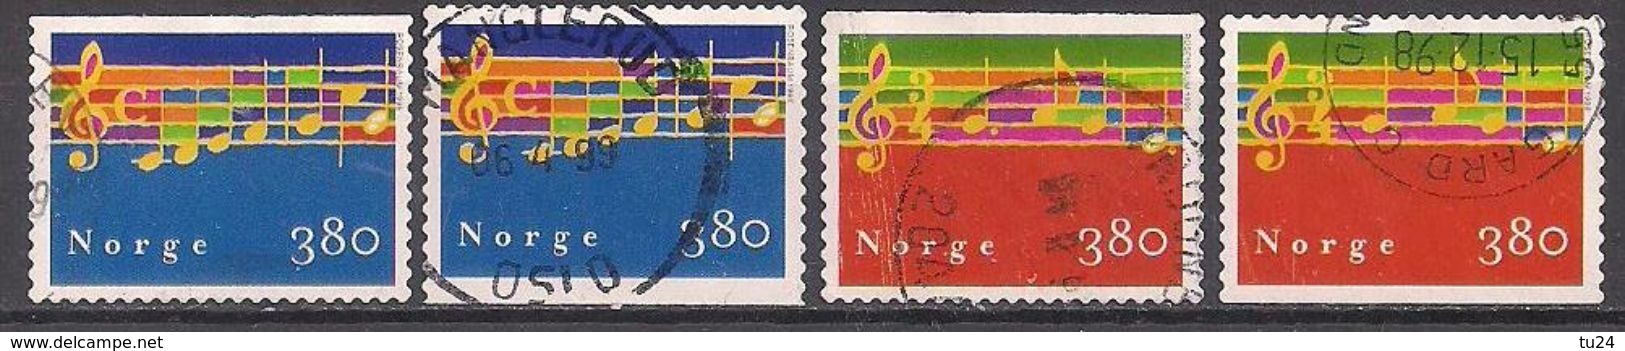 Norwegen  (1998)  Mi.Nr. 1297 + 1298  Gest. / Used  (6fi22) - Norwegen